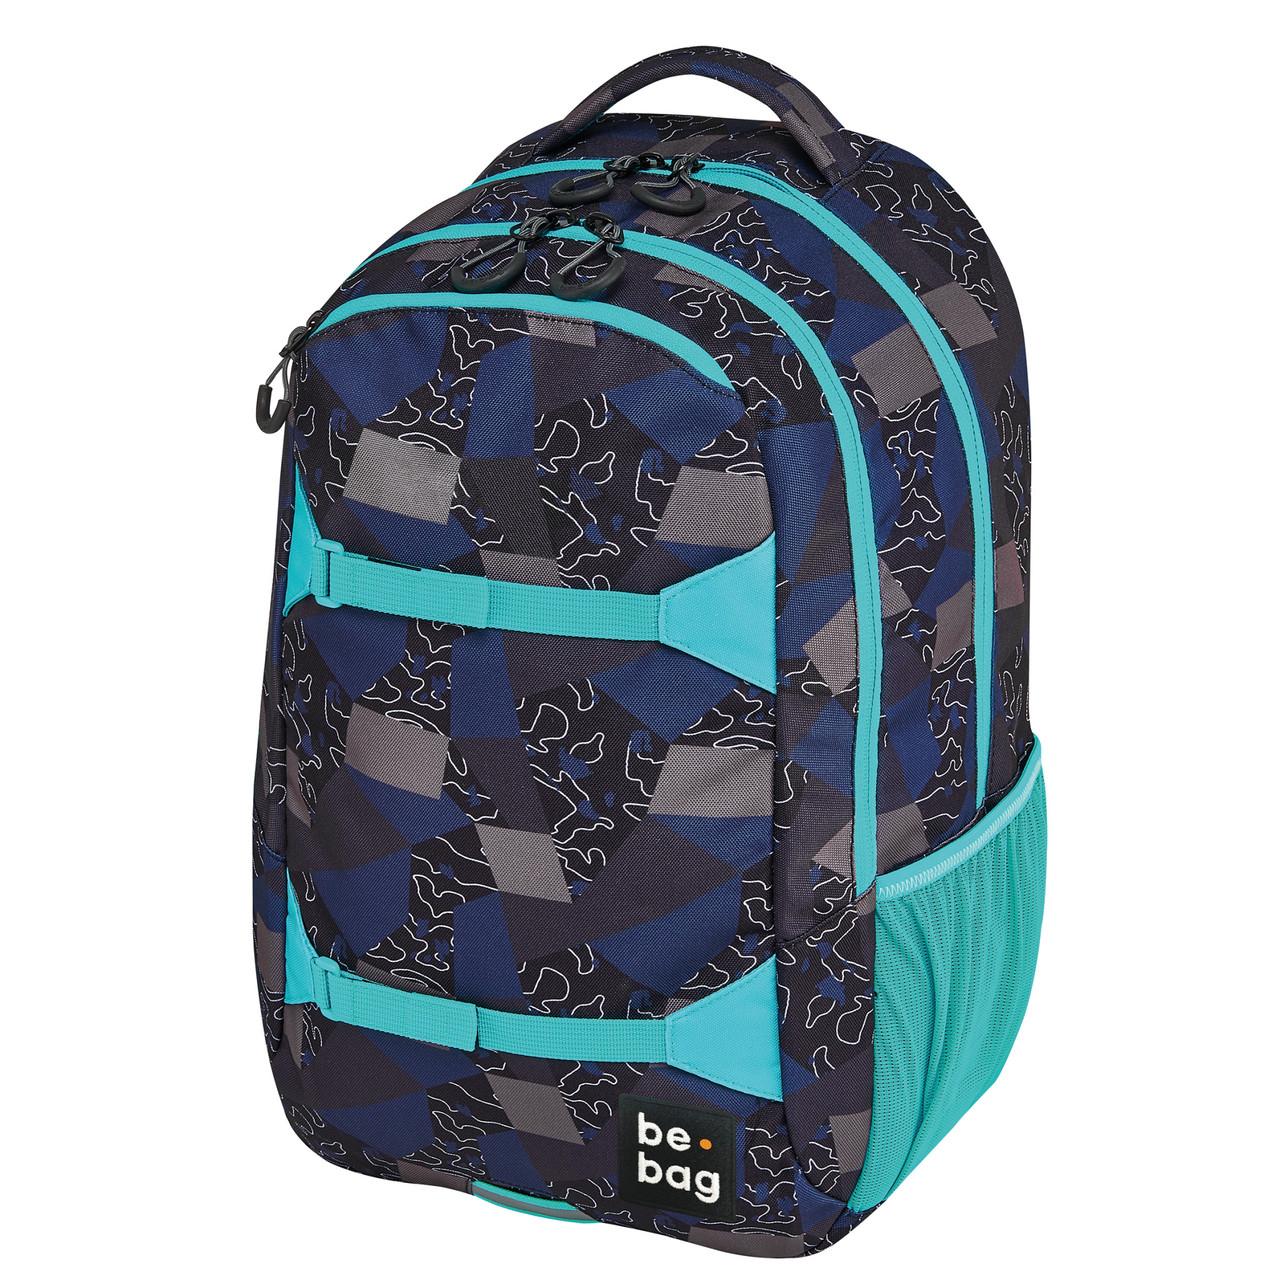 "Рюкзак Herlitz Be.Bag be.explorer Edgy Labyrinth синьо-блакитний ""лабіринт"""